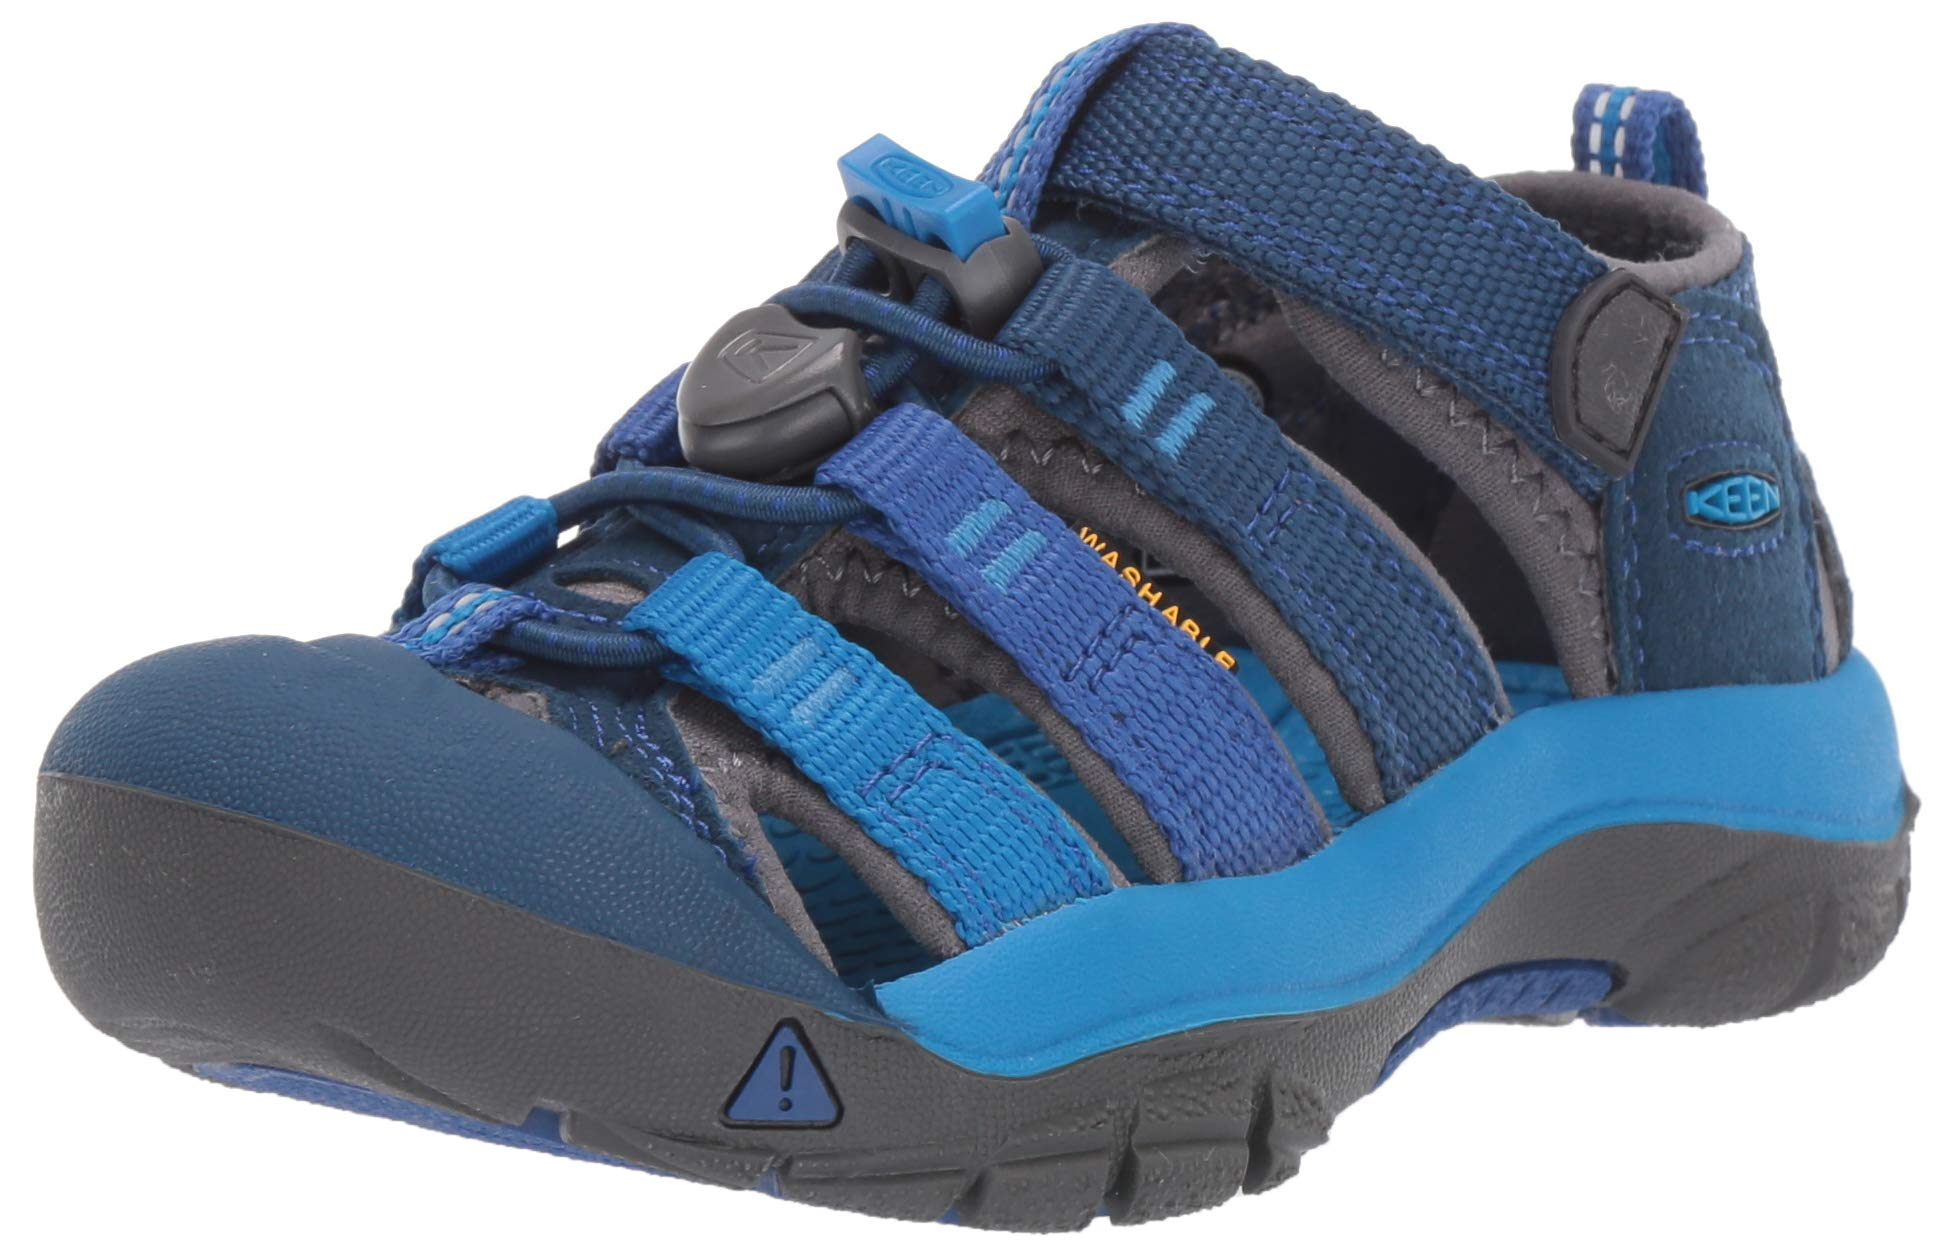 Keen Unisex Newport H2 Water Shoe Opal/Vibrant Blue, 12 M US Little Kid